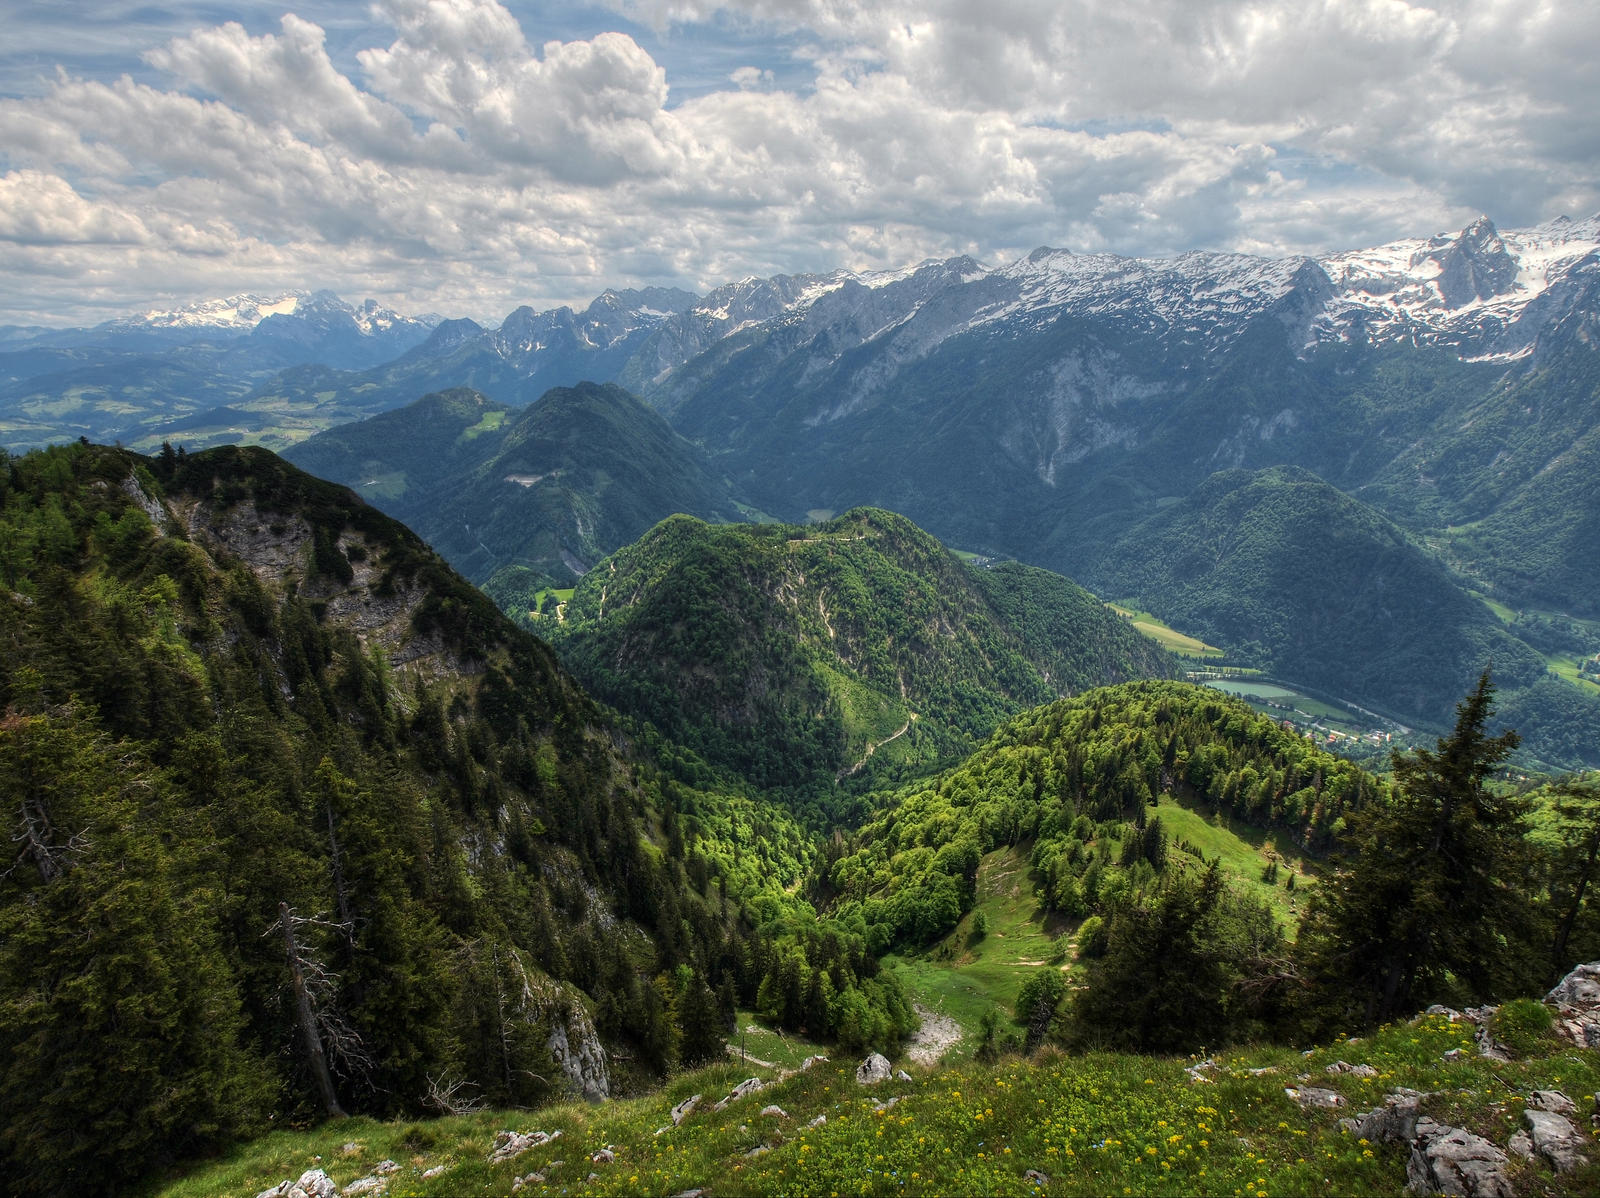 Deep Valley by Burtn